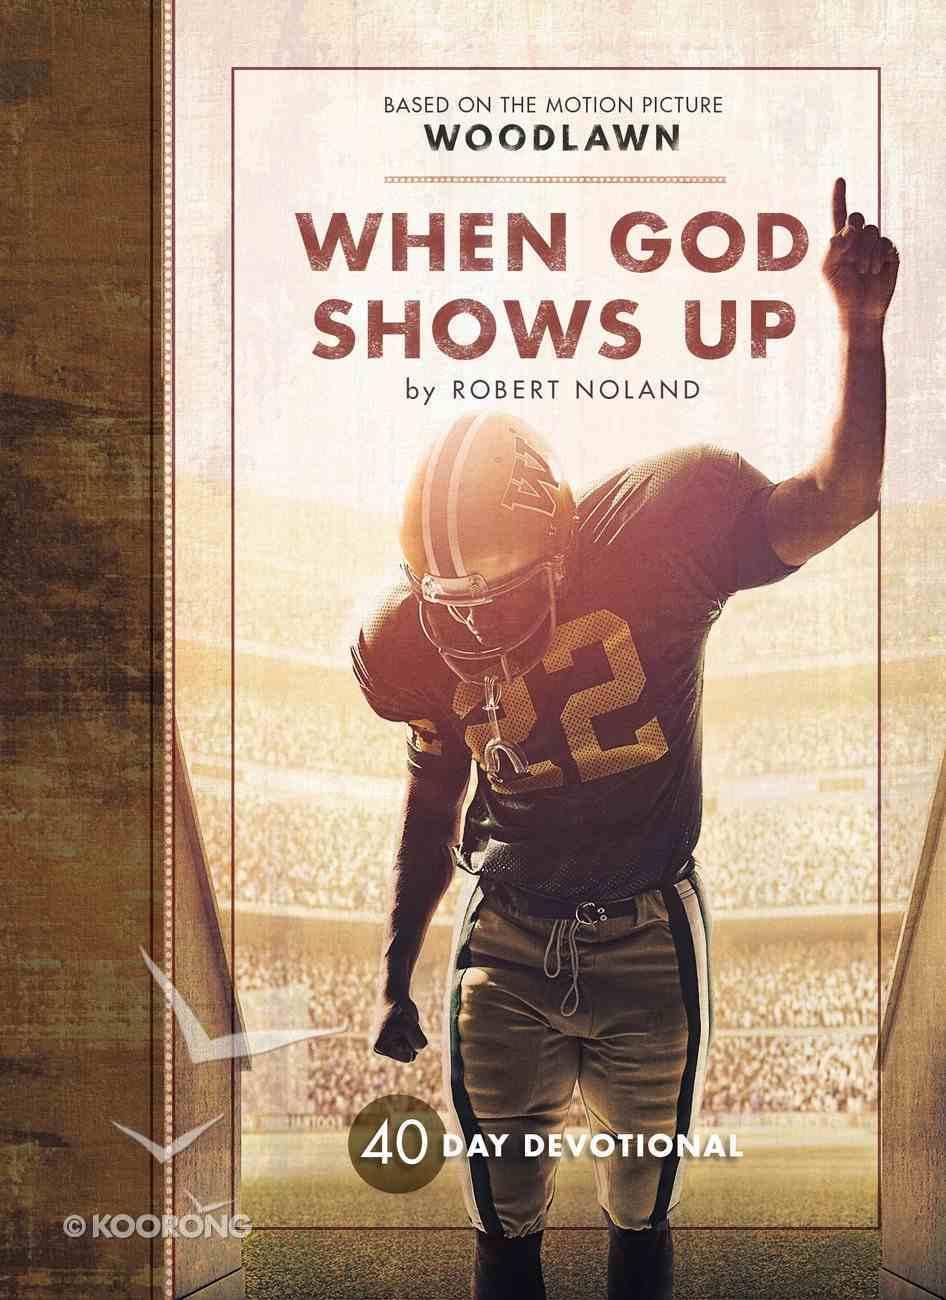 Woodlawn: When God Shows Up (Movie Devotional) eBook